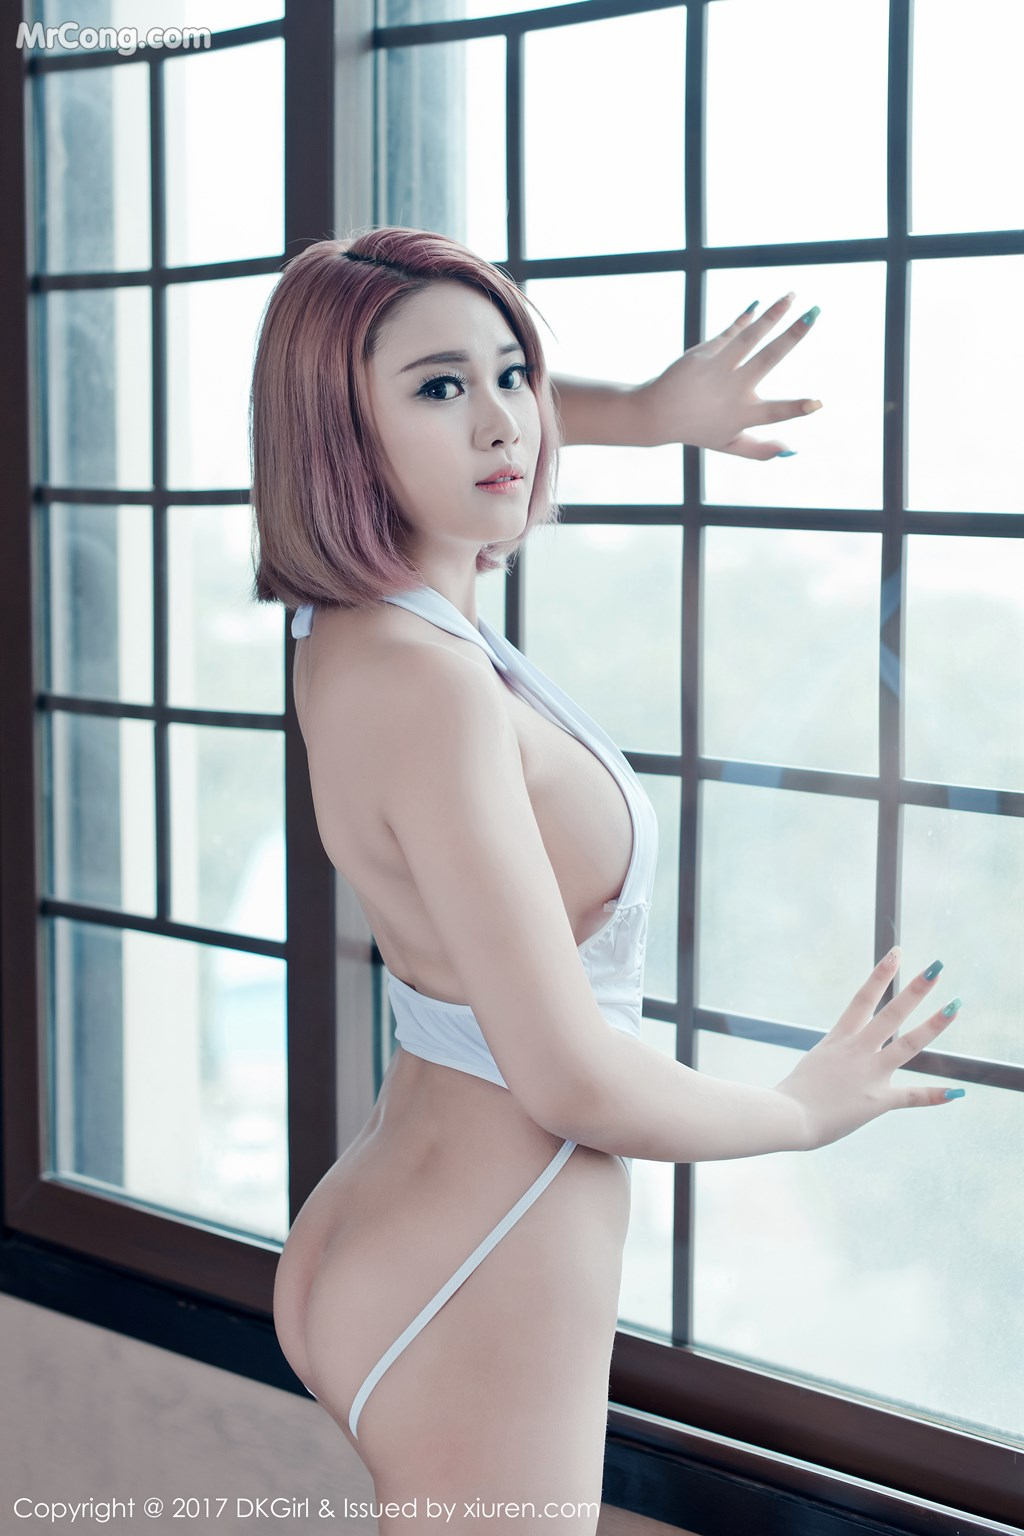 Image DKGirl-Vol.045-Meng-Bao-Er-BoA-MrCong.com-001 in post DKGirl Vol.045: Người mẫu Meng Bao Er (萌宝儿BoA) (56 ảnh)